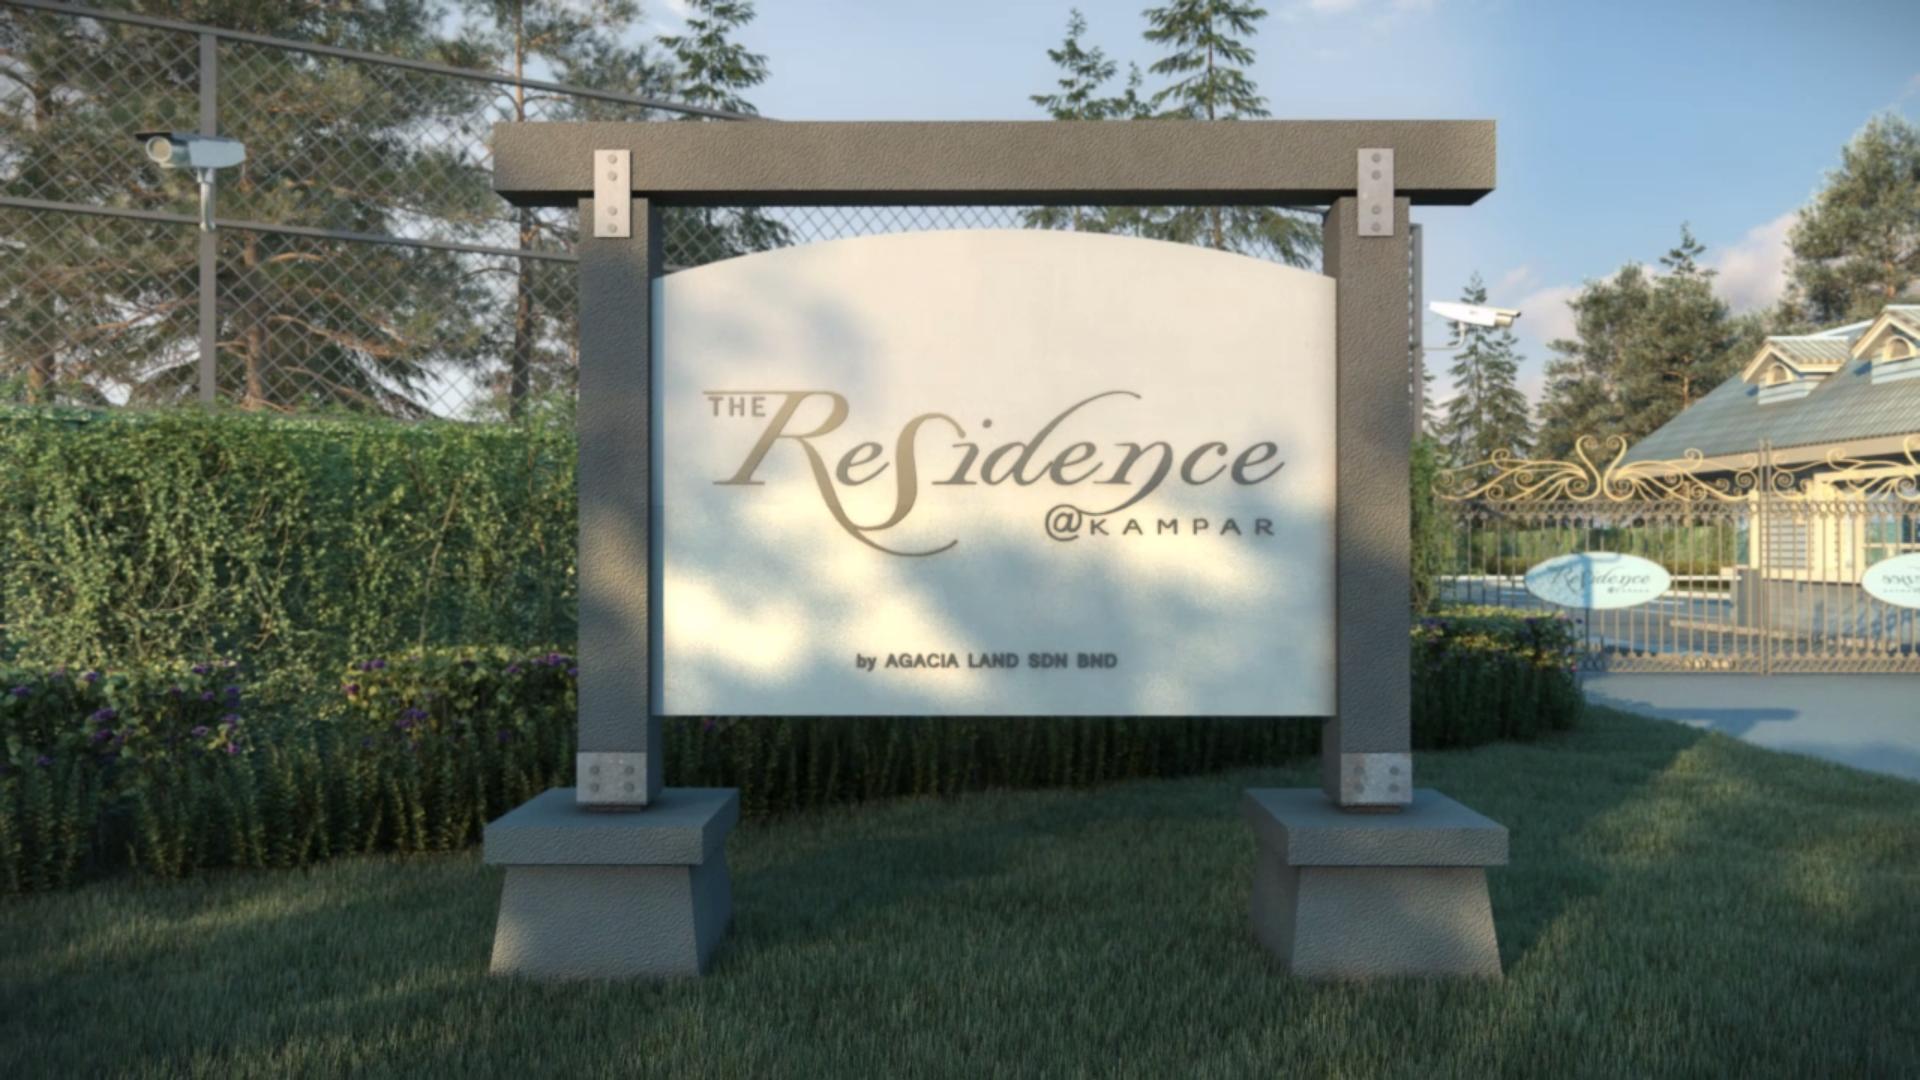 Entrance statement